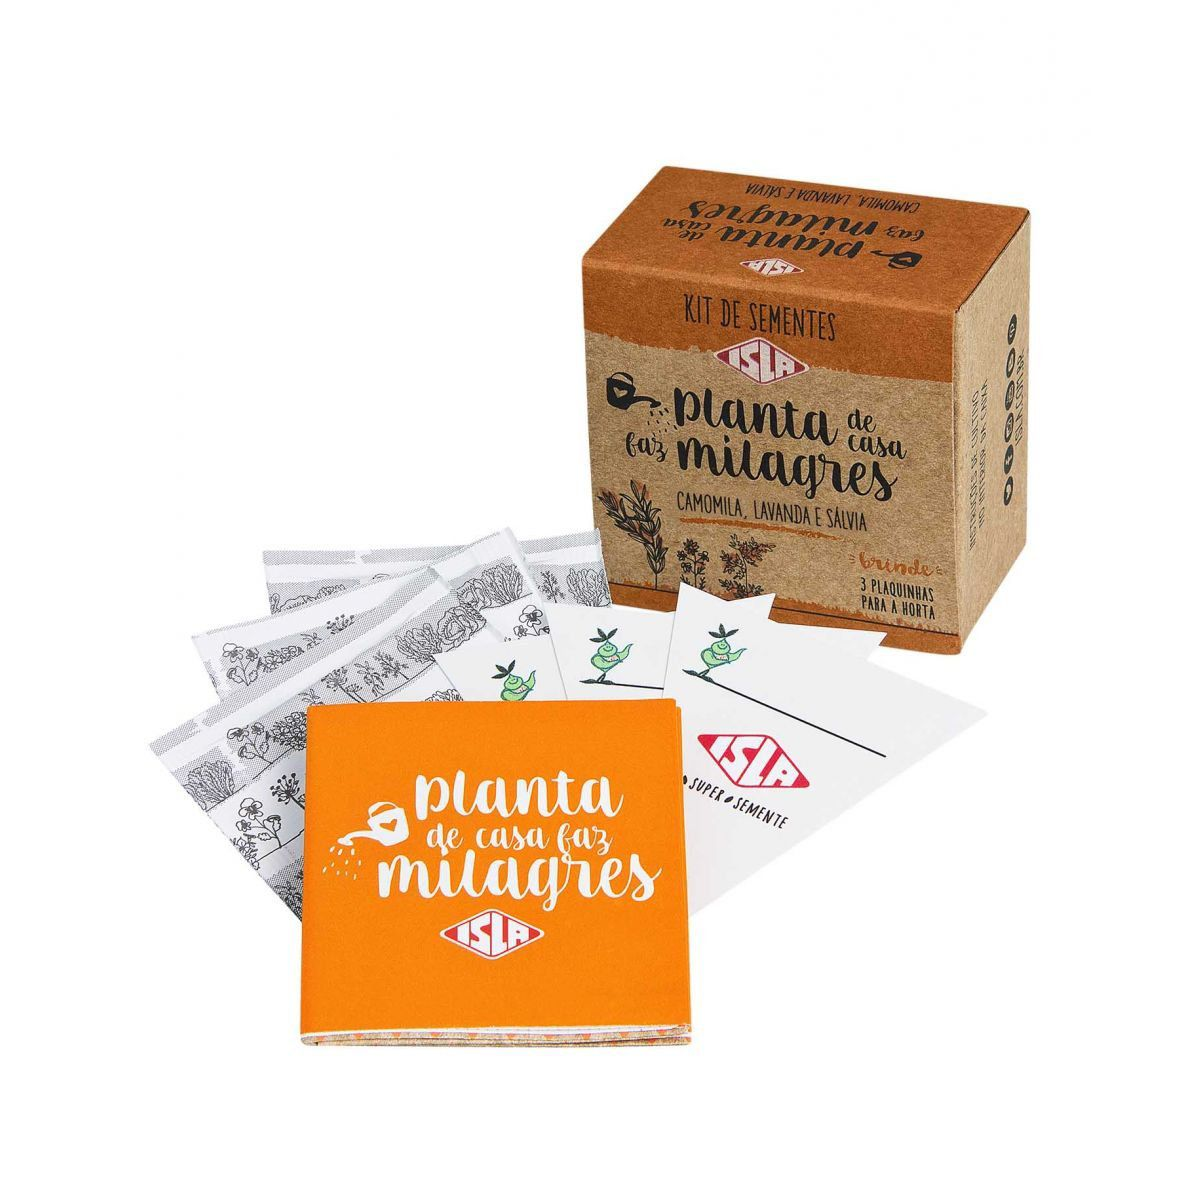 "Kit de Sementes ""Planta de Casa Faz Milagres"" (Camomila, Lavanda e Sálvia)"